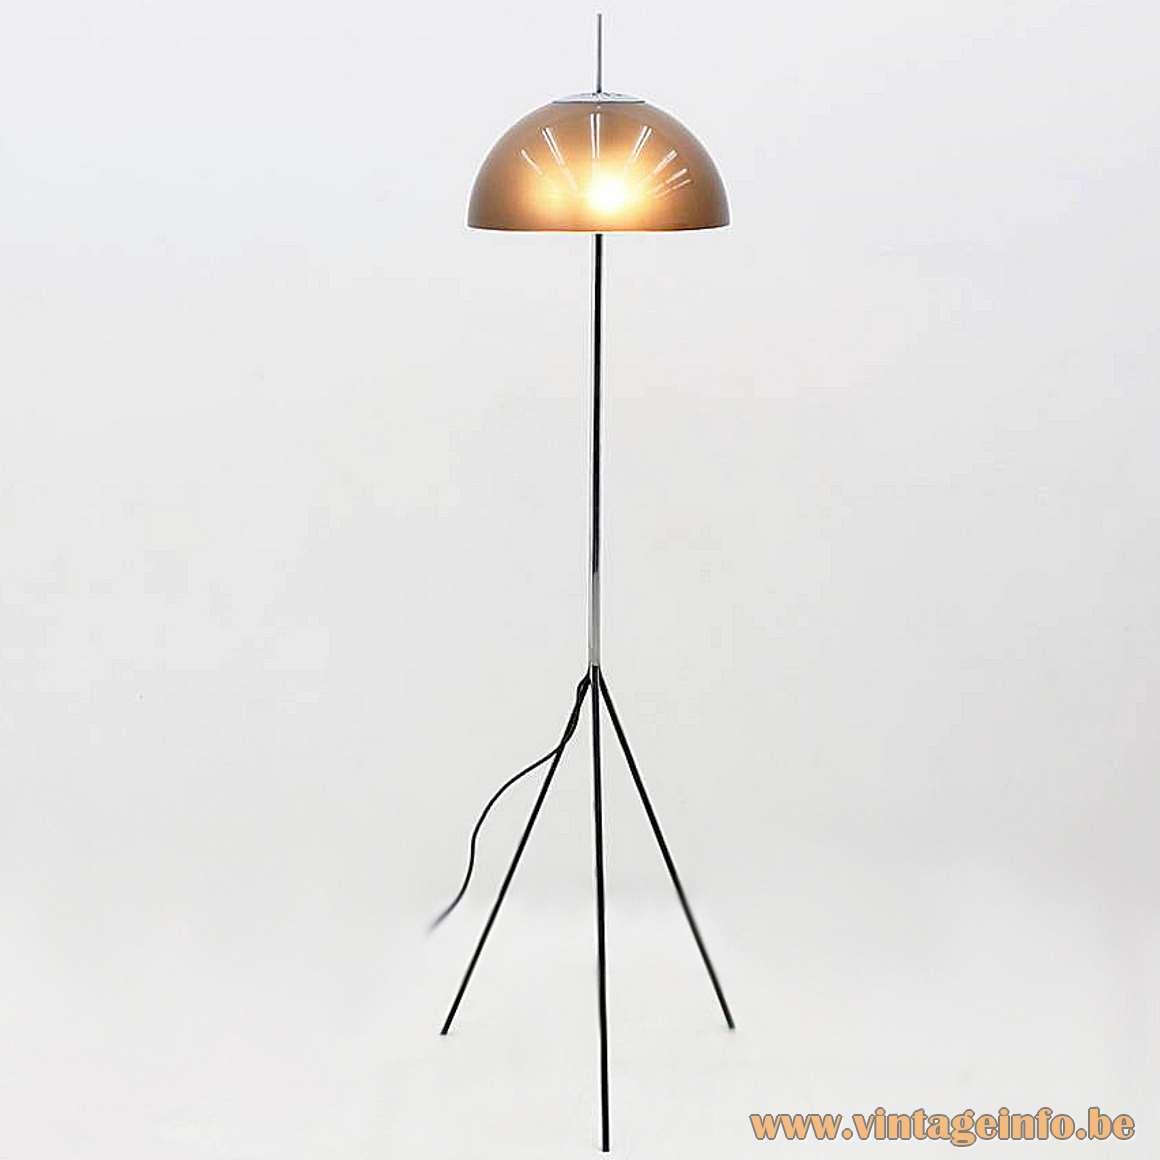 Arteluce acrylic floor lamp design: Gino Sarfatti Arteluce tripod chrome 1960s MCM